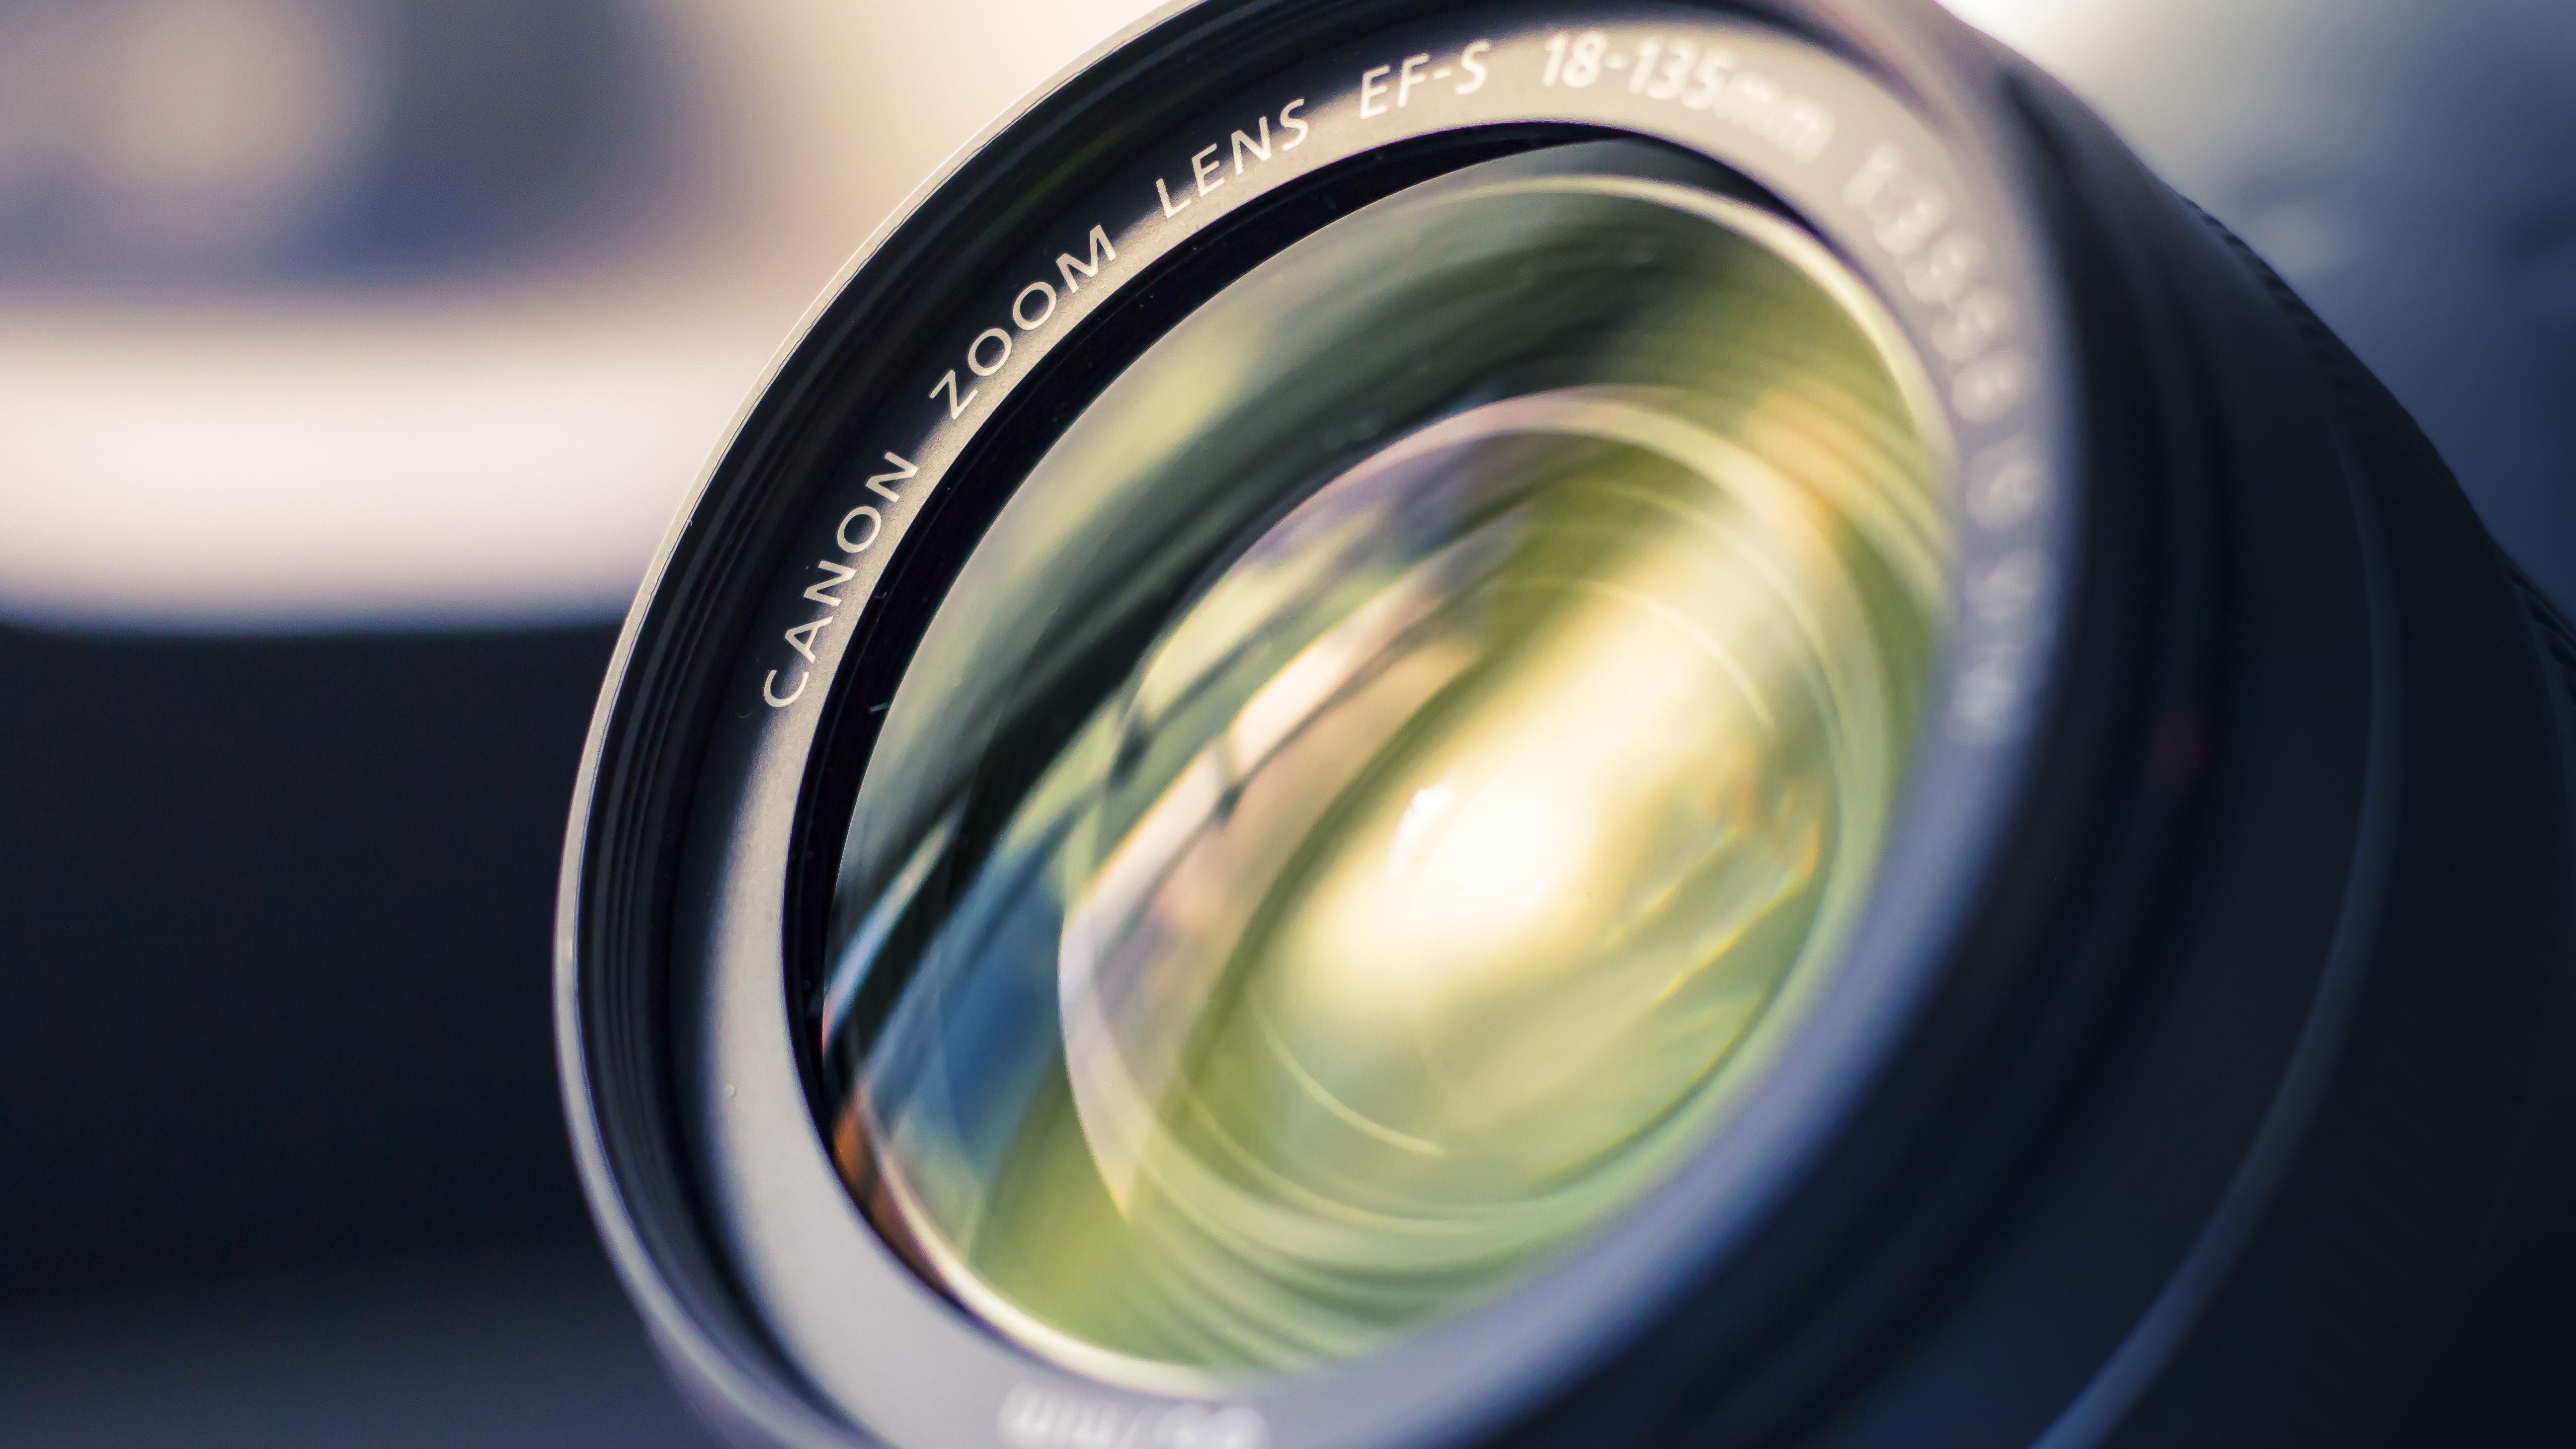 Photographystockphoto photographystockimages photographystock picture - Free Stock Photo Of Camera Photography Lens Zoom